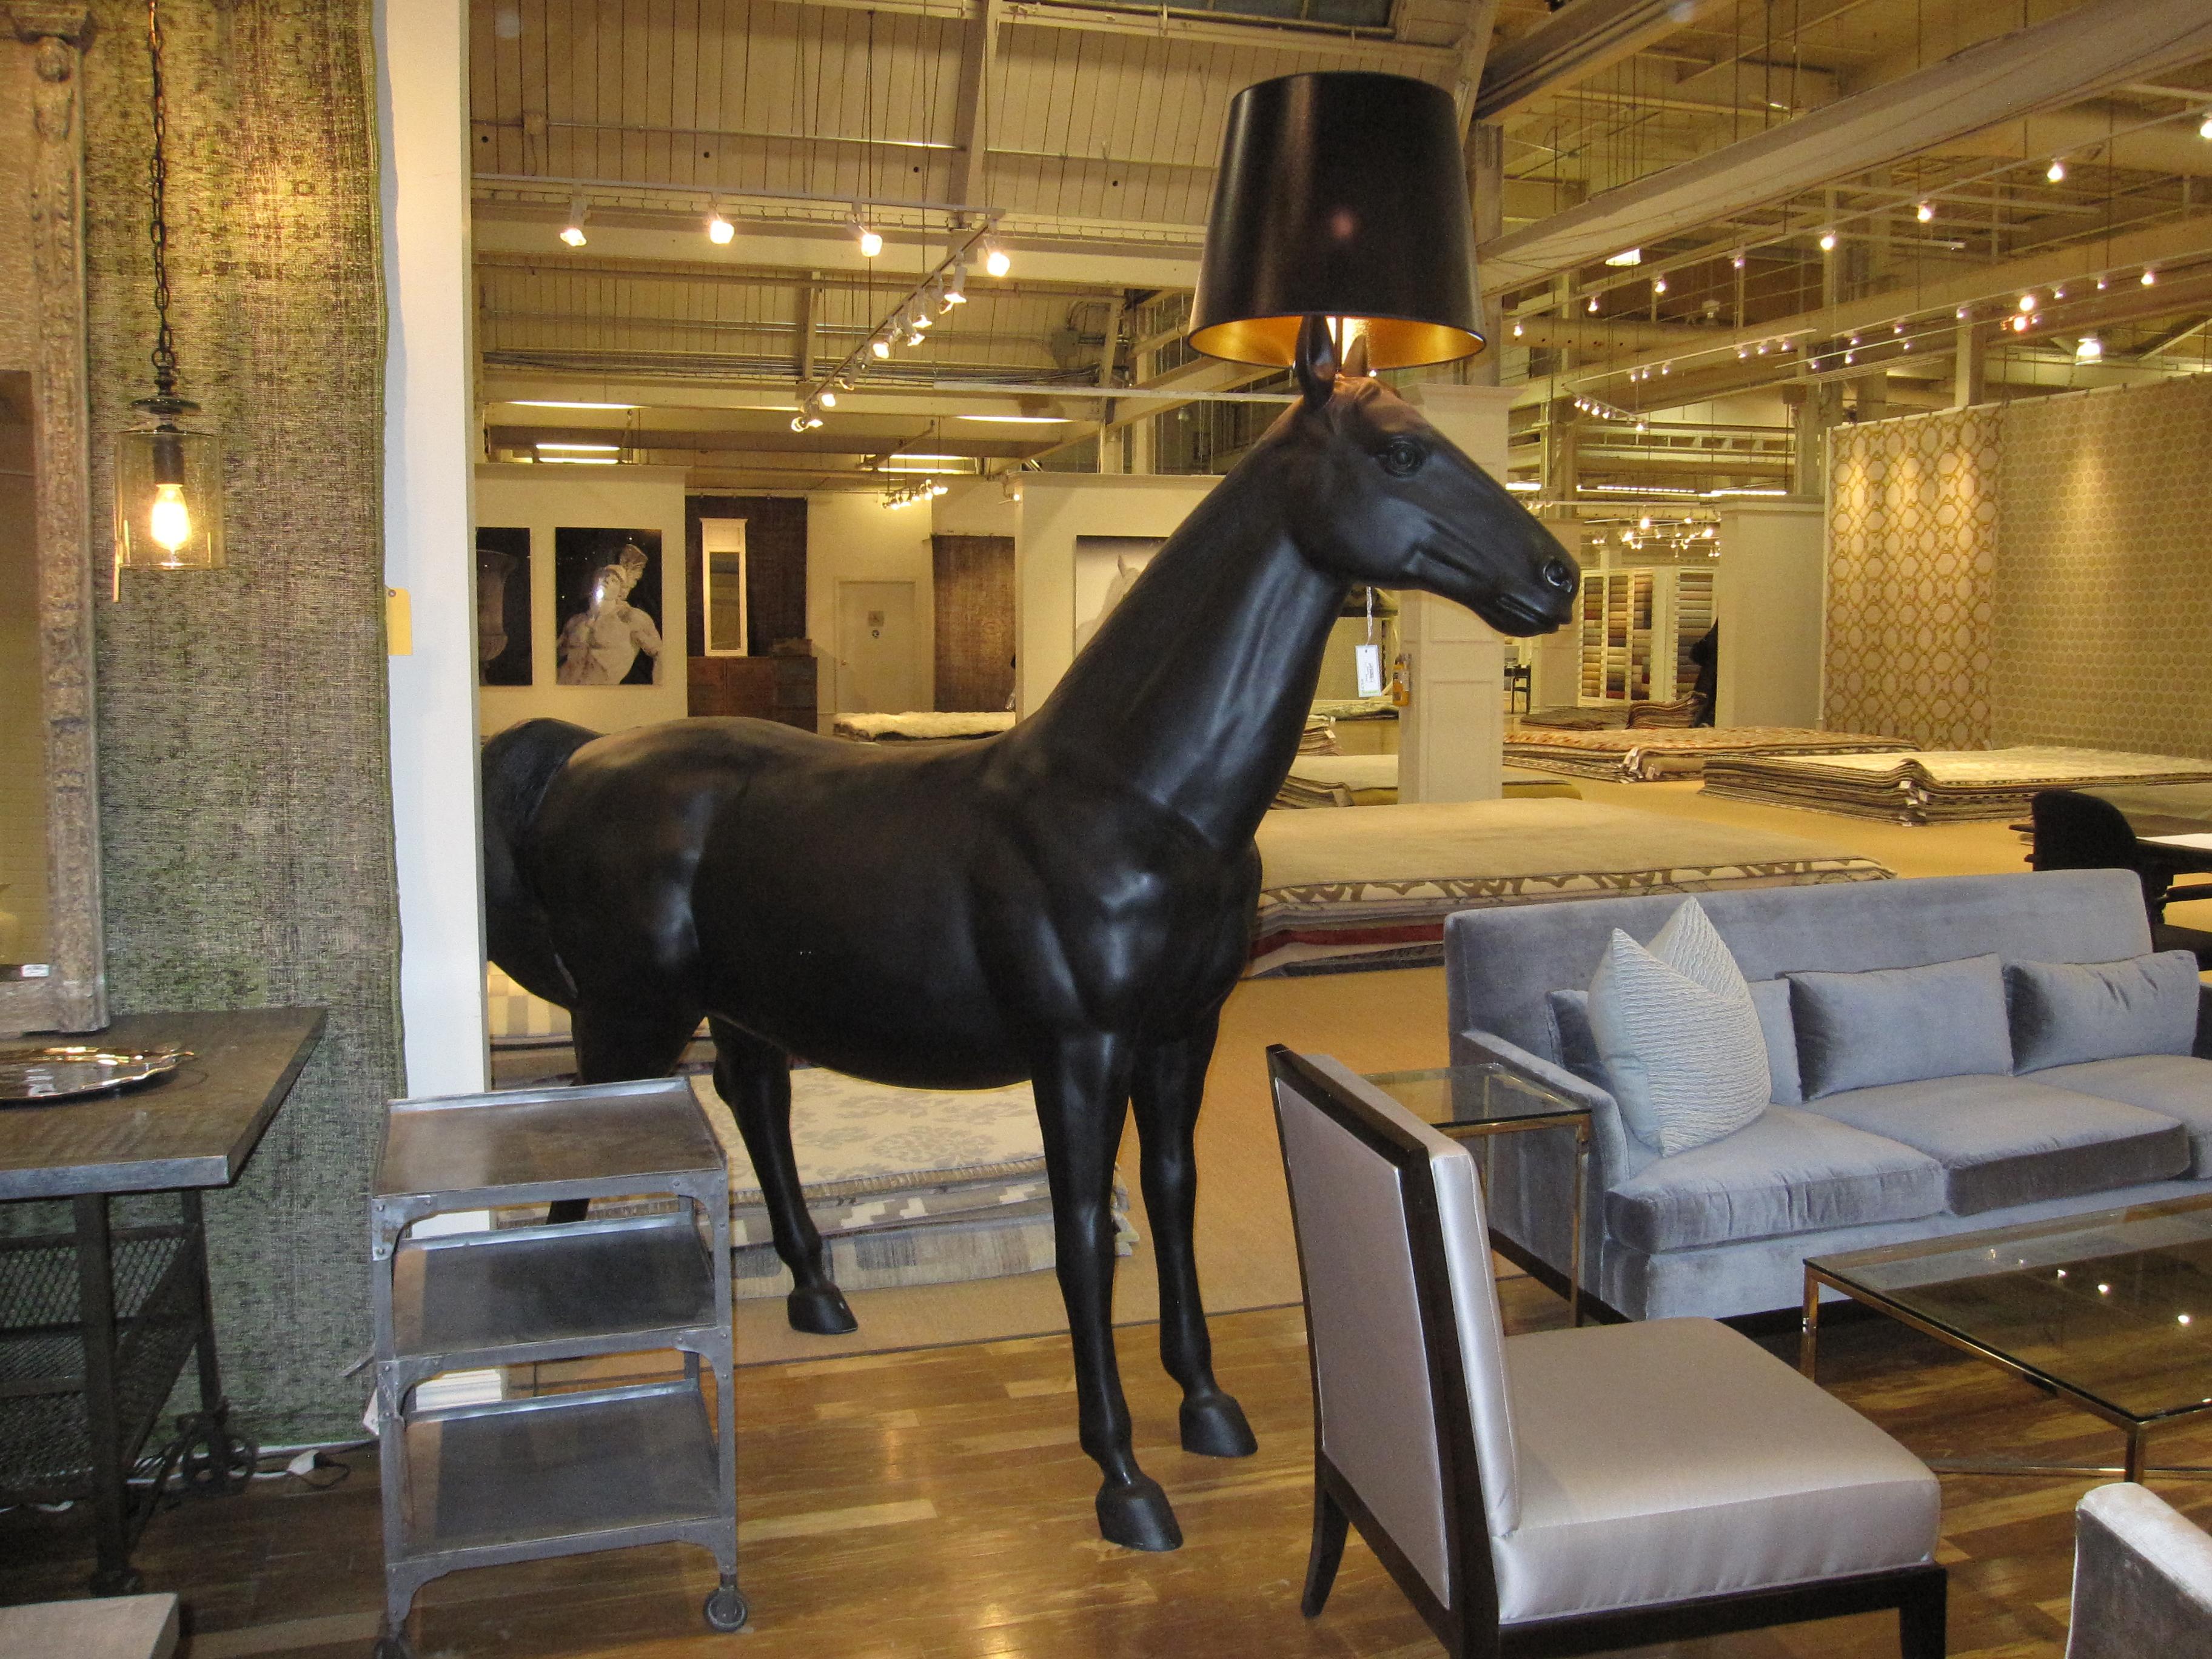 horse floor lamp moooi horse lamp floor lamp moooi  - floor lamp horse floor lamp modmissy